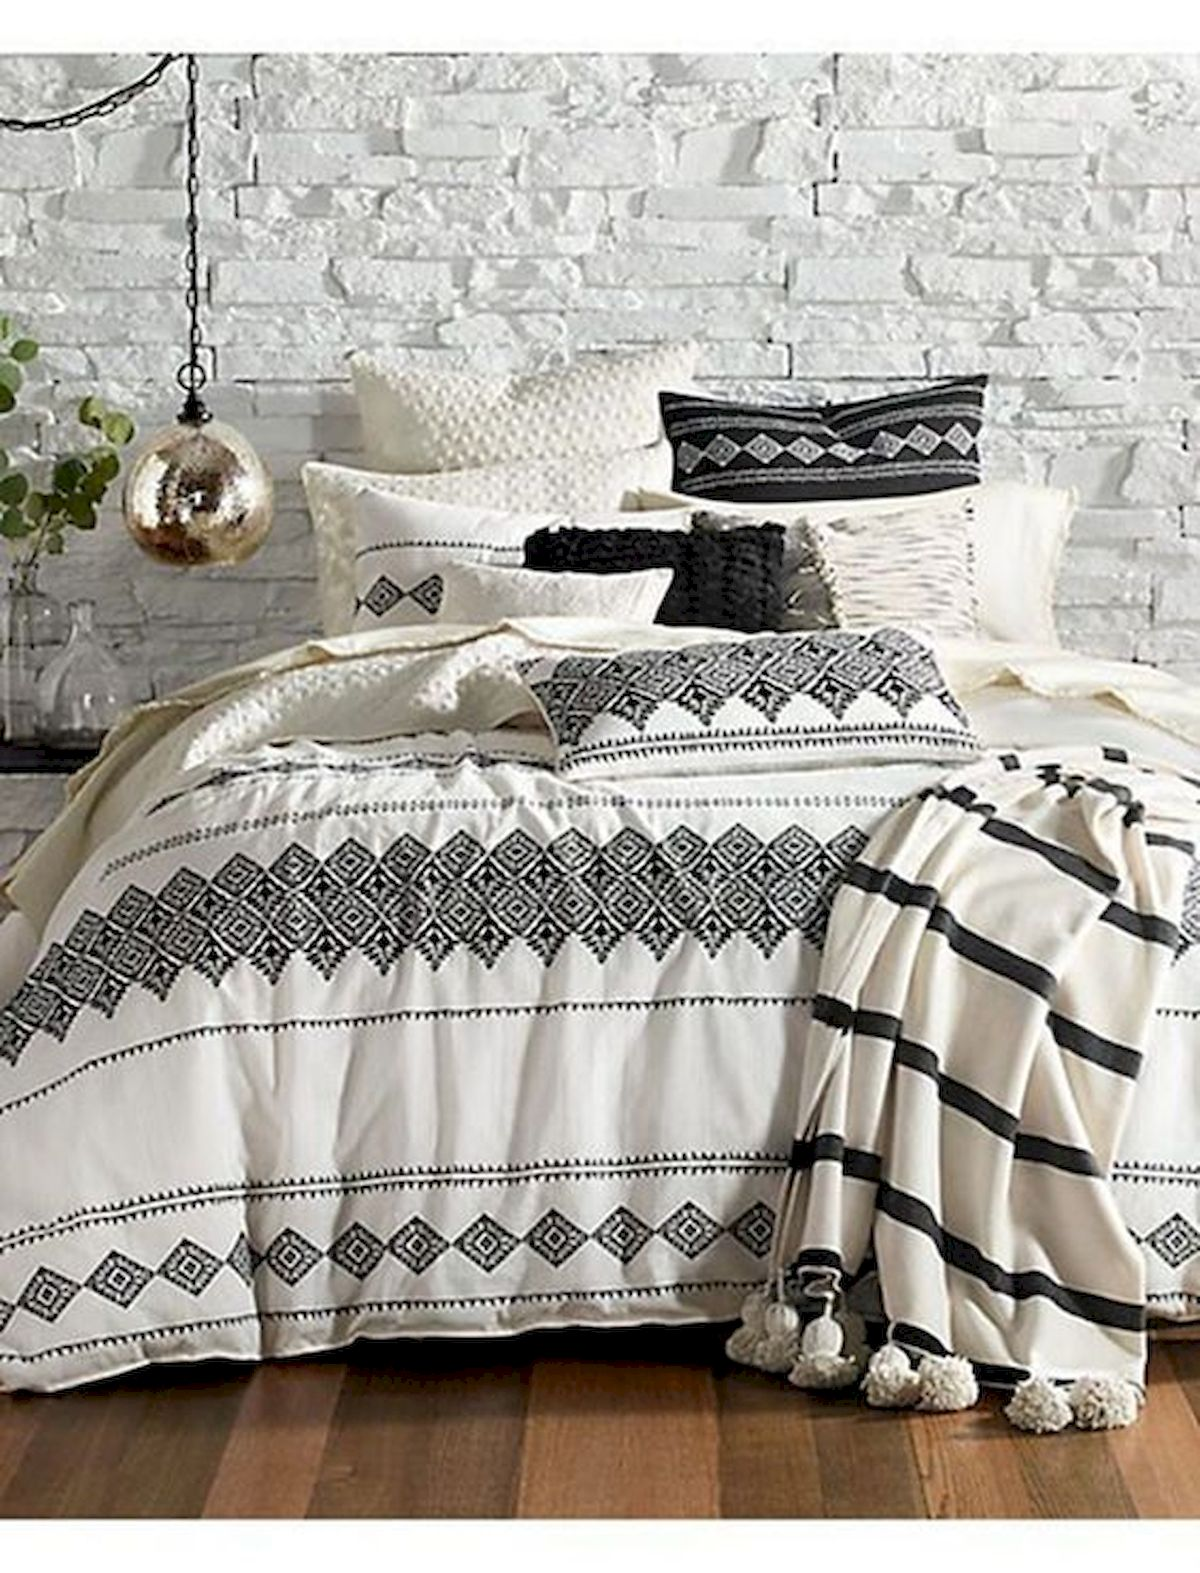 40 Fantastic DIY Decor Ideas For Farmhouse Boho Bedroom Design (38)